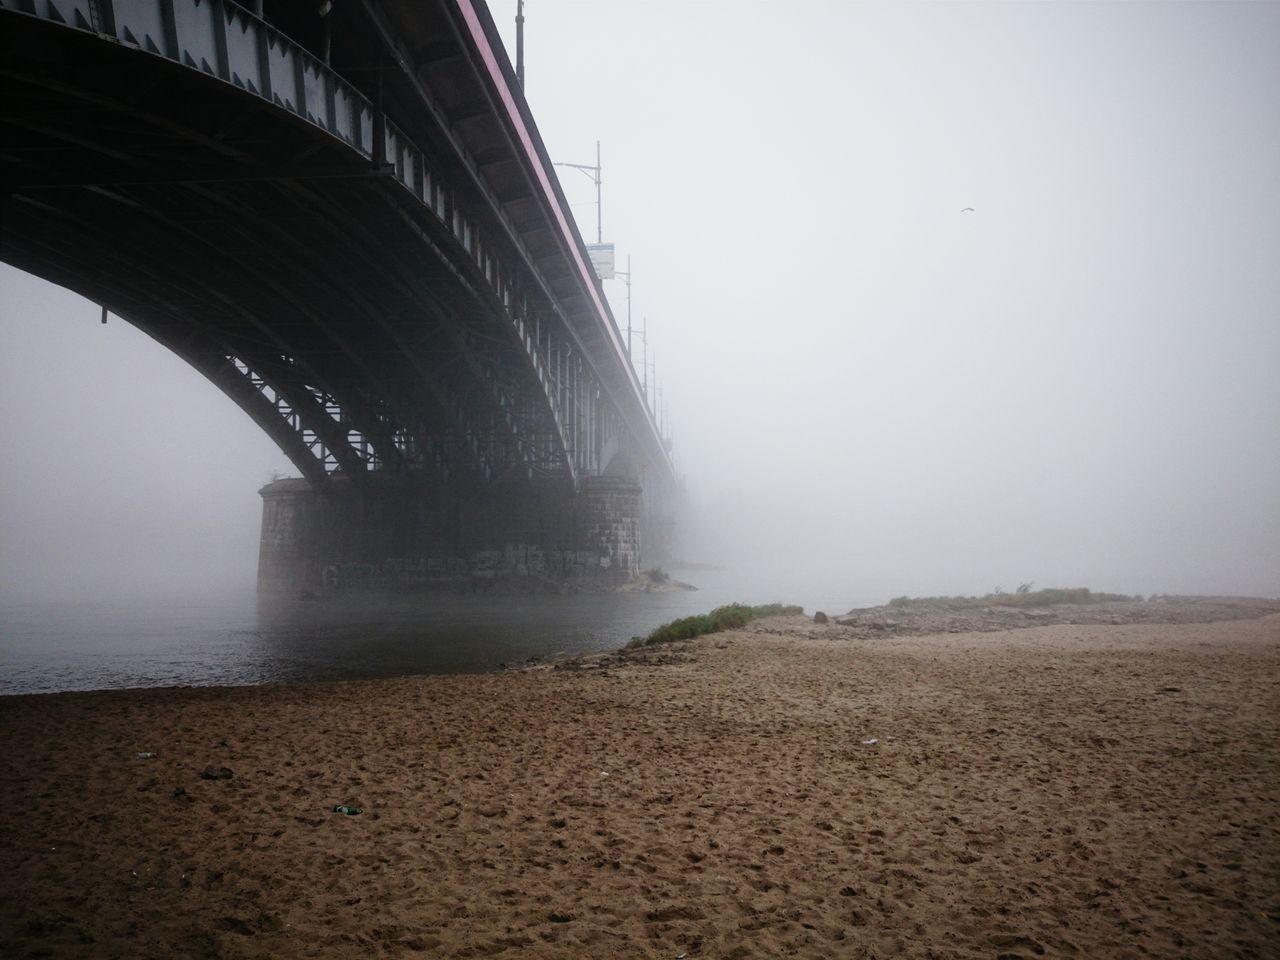 Low Angle View Of Bridge Through Fog